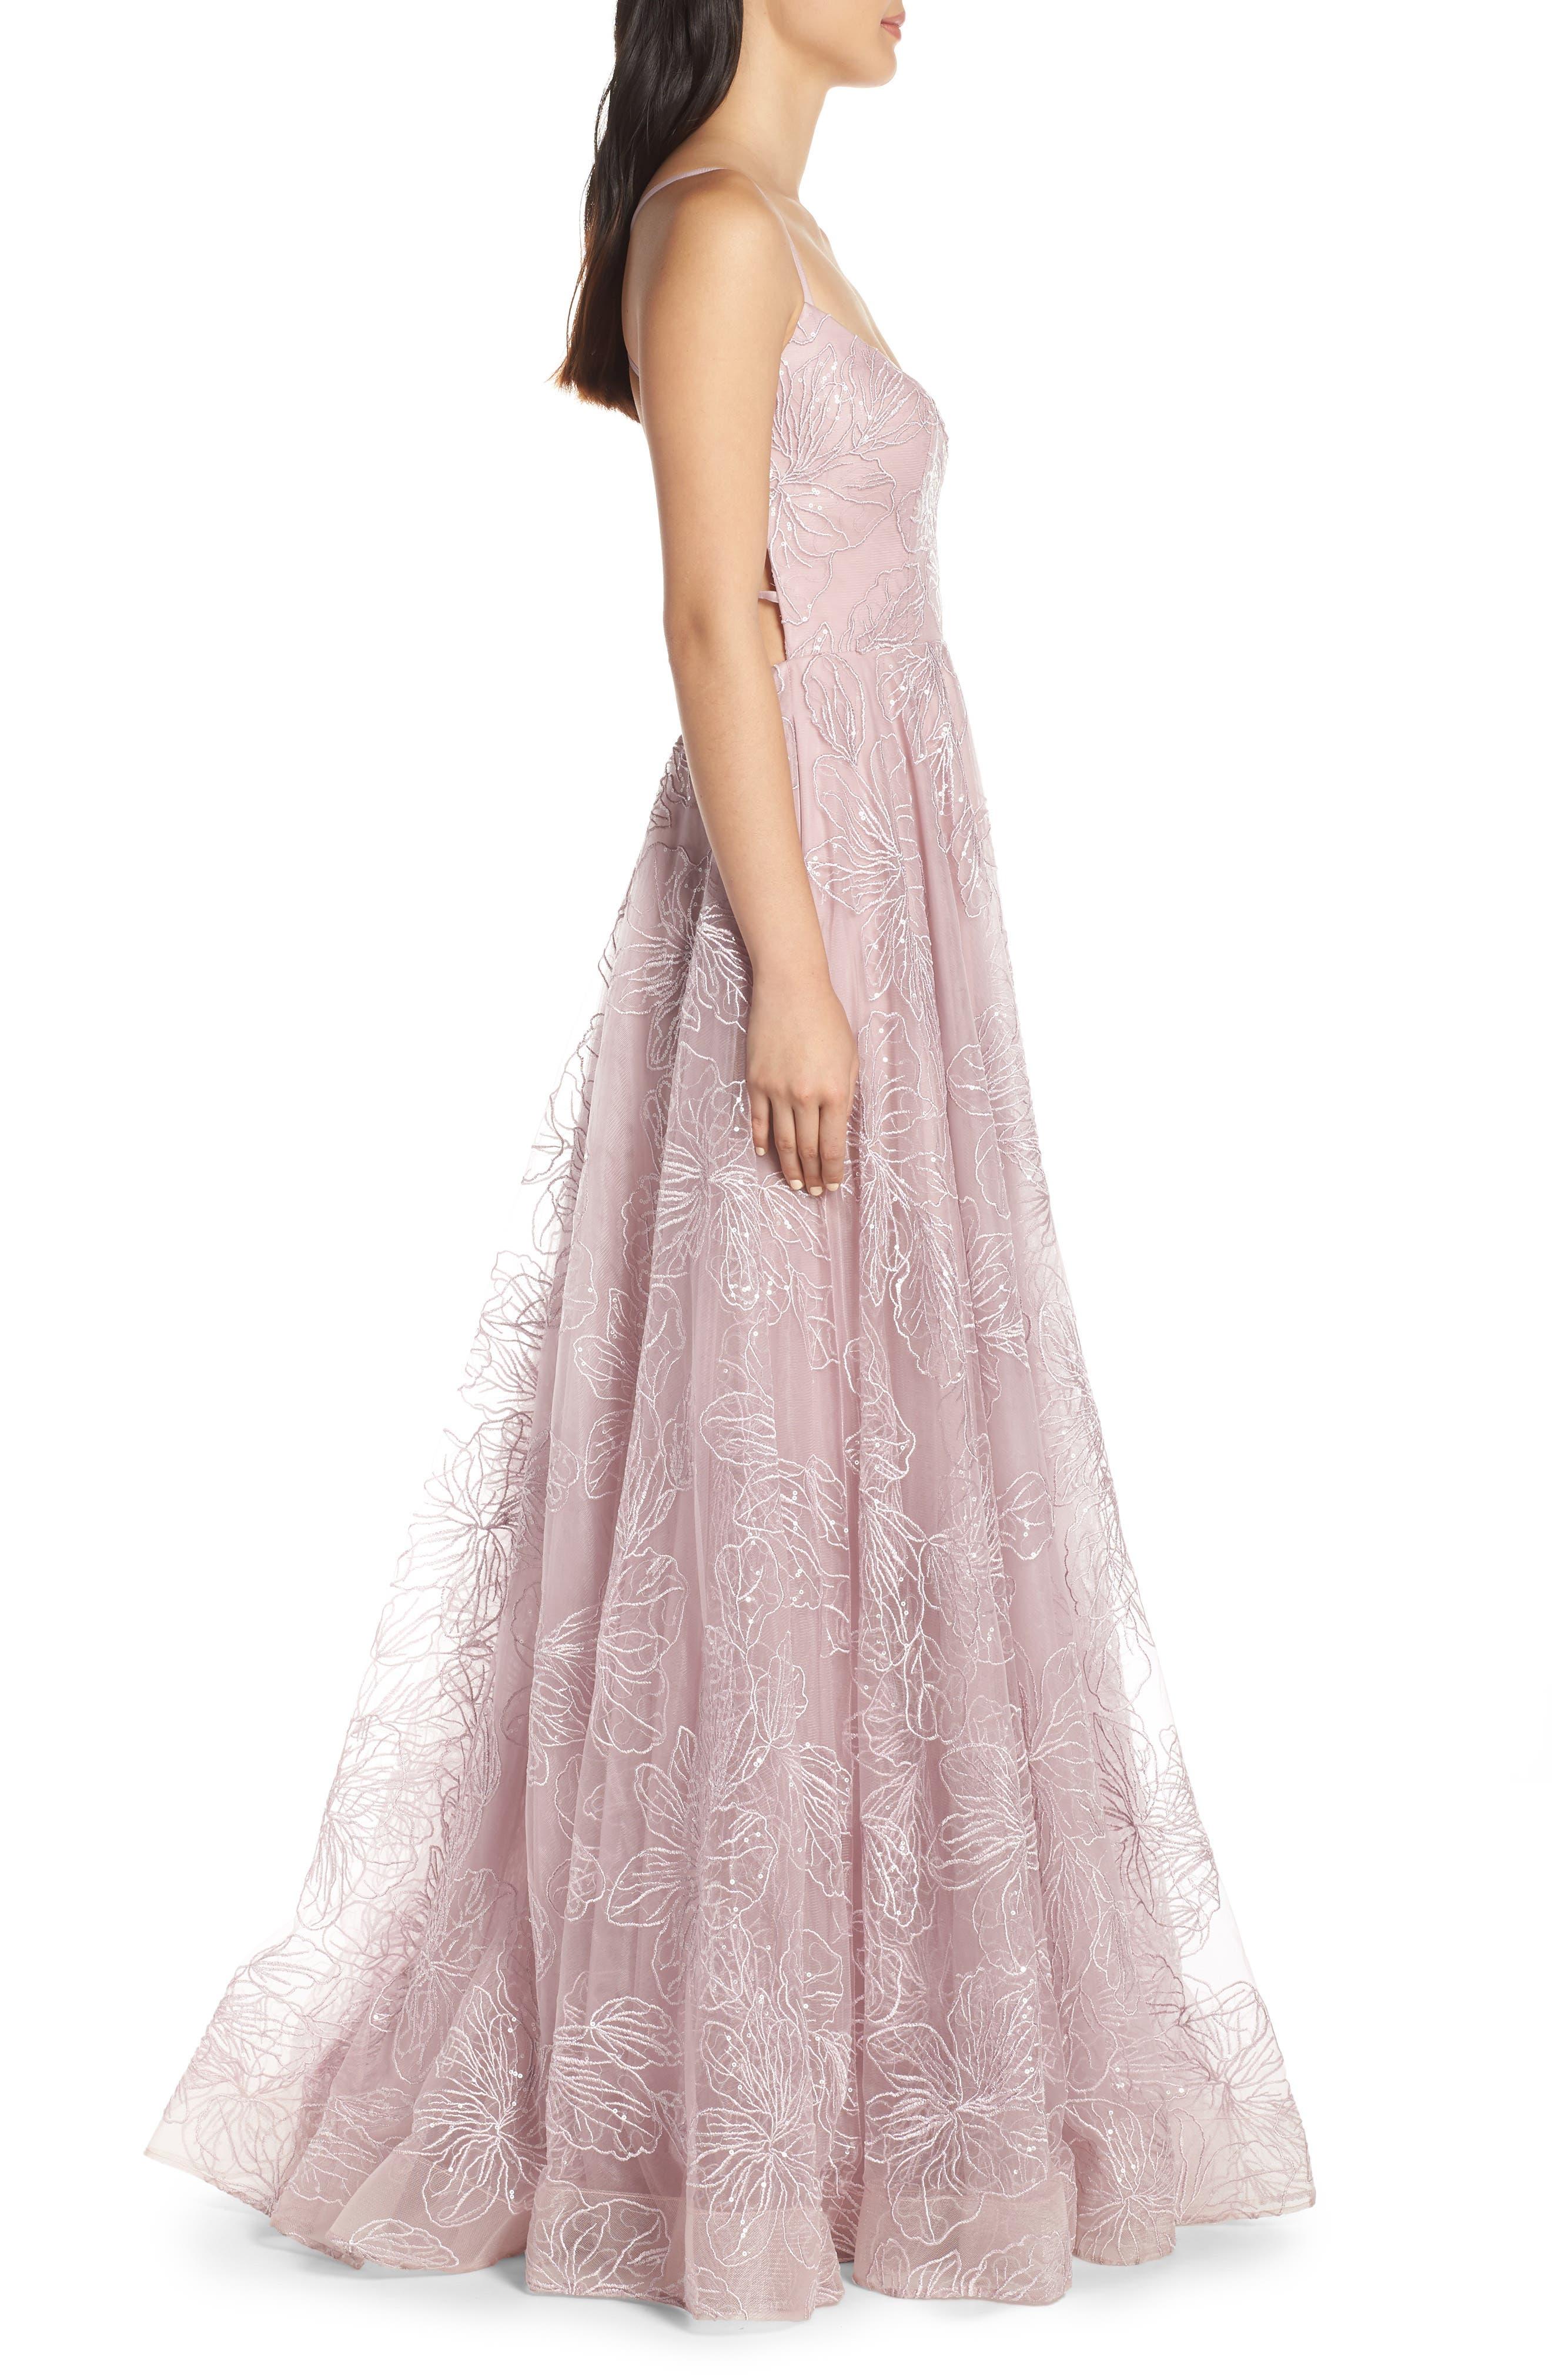 LA FEMME, Metallic Floral Embellished Evening Dress, Alternate thumbnail 4, color, MAUVE